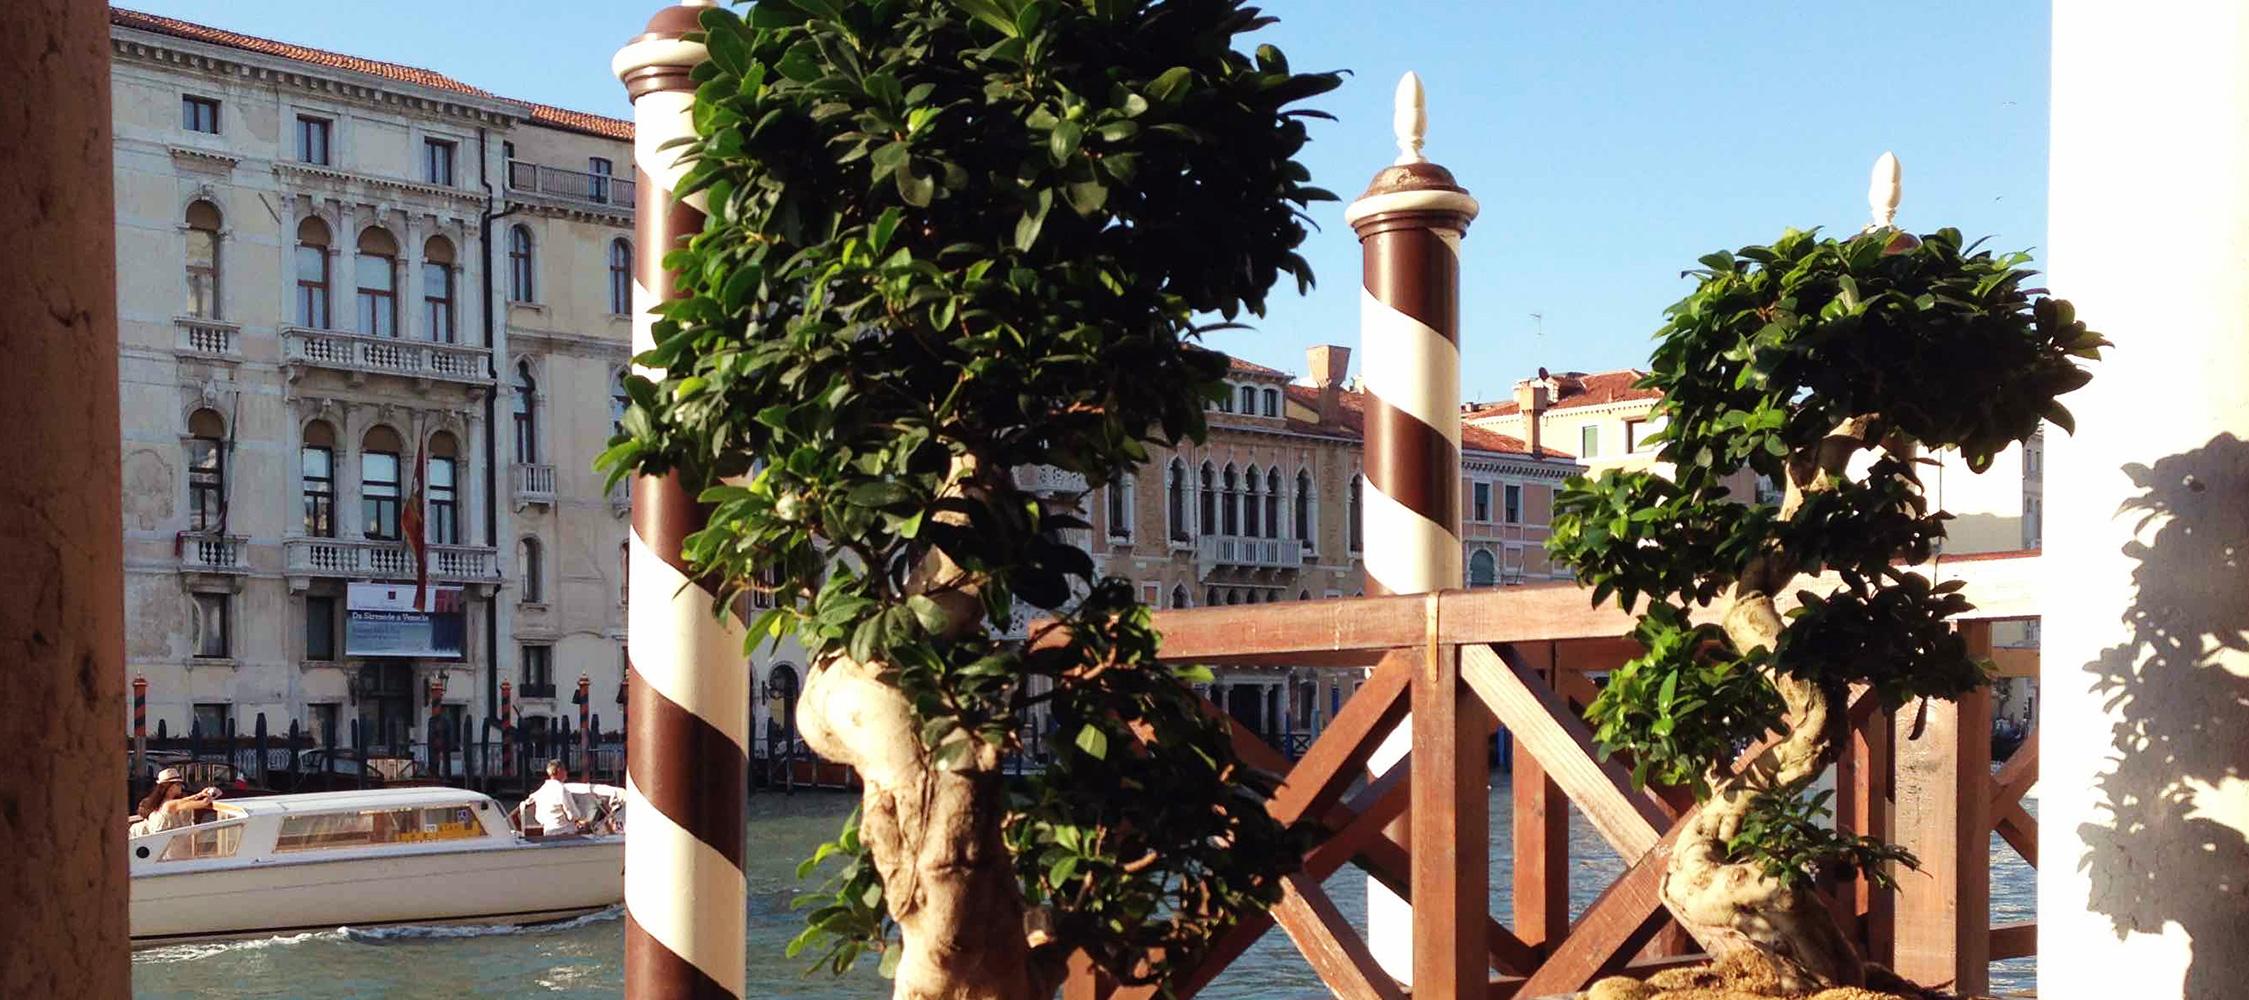 Venise---28.jpg